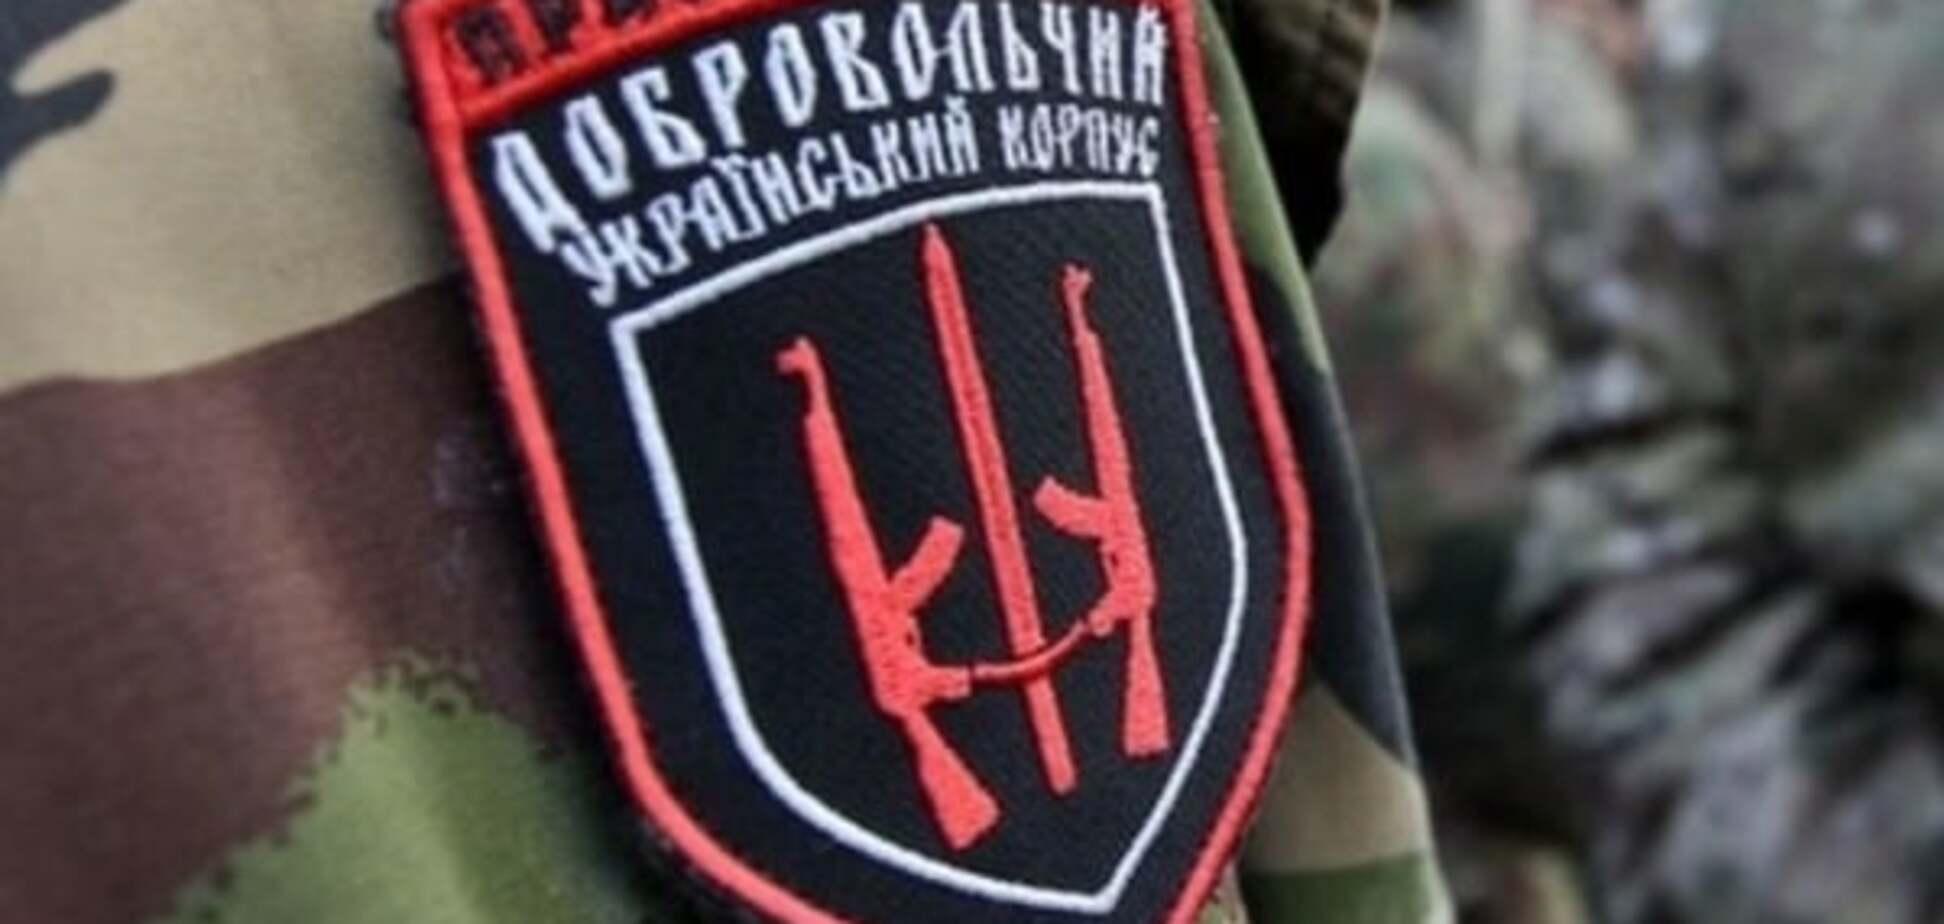 У СБУ викликали на допит членів 'Правого сектора' через блекаут в Криму